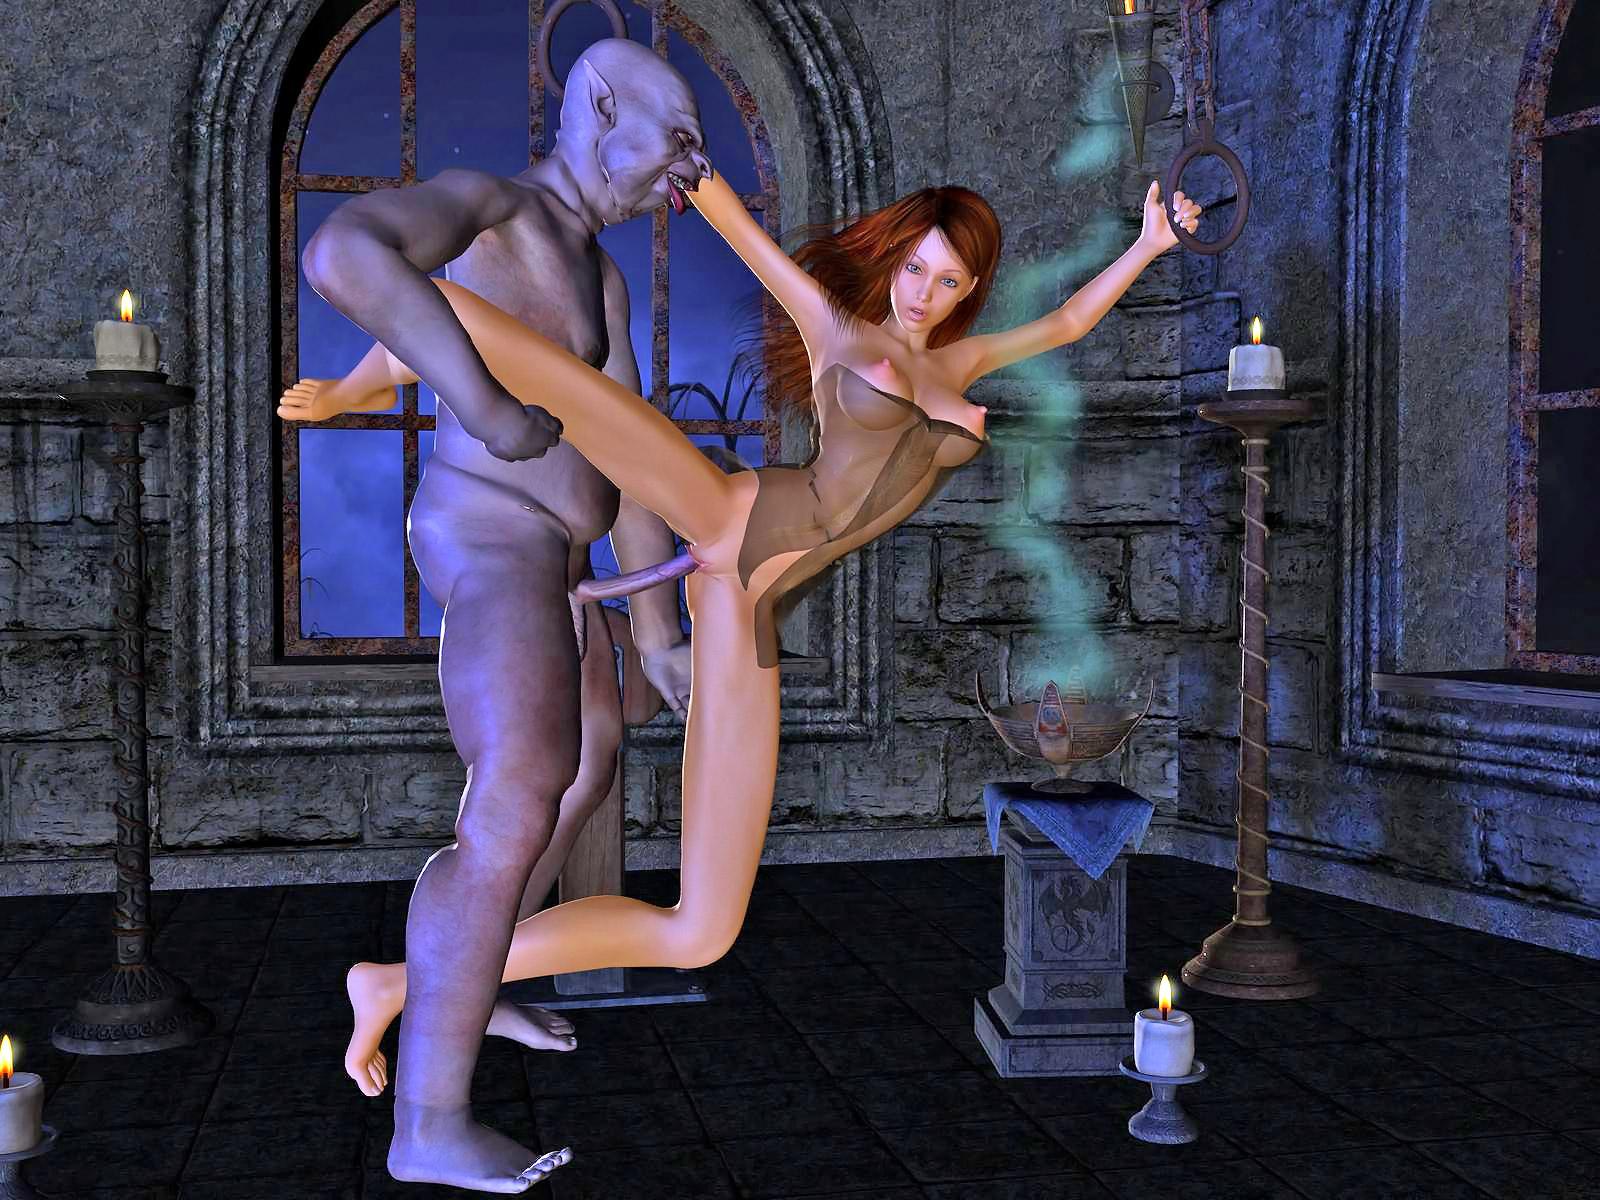 Hot fantasy toon adult scene